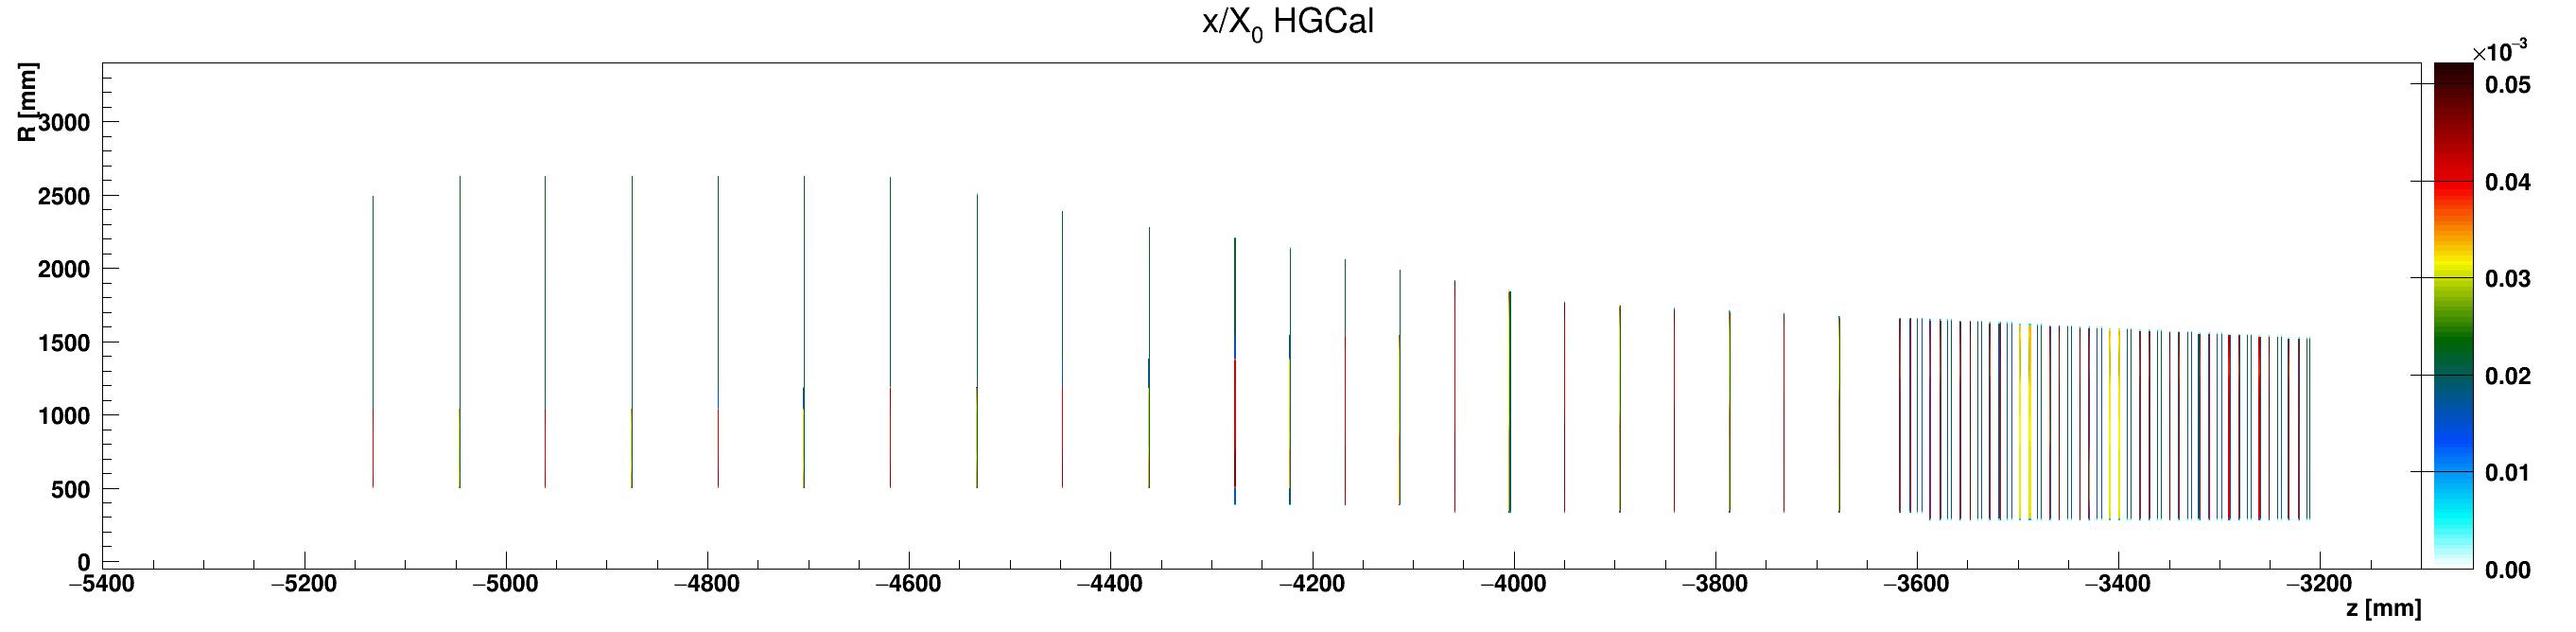 HGCal_x_vs_z_vs_RlocEpoxy_ZminusZoom.png